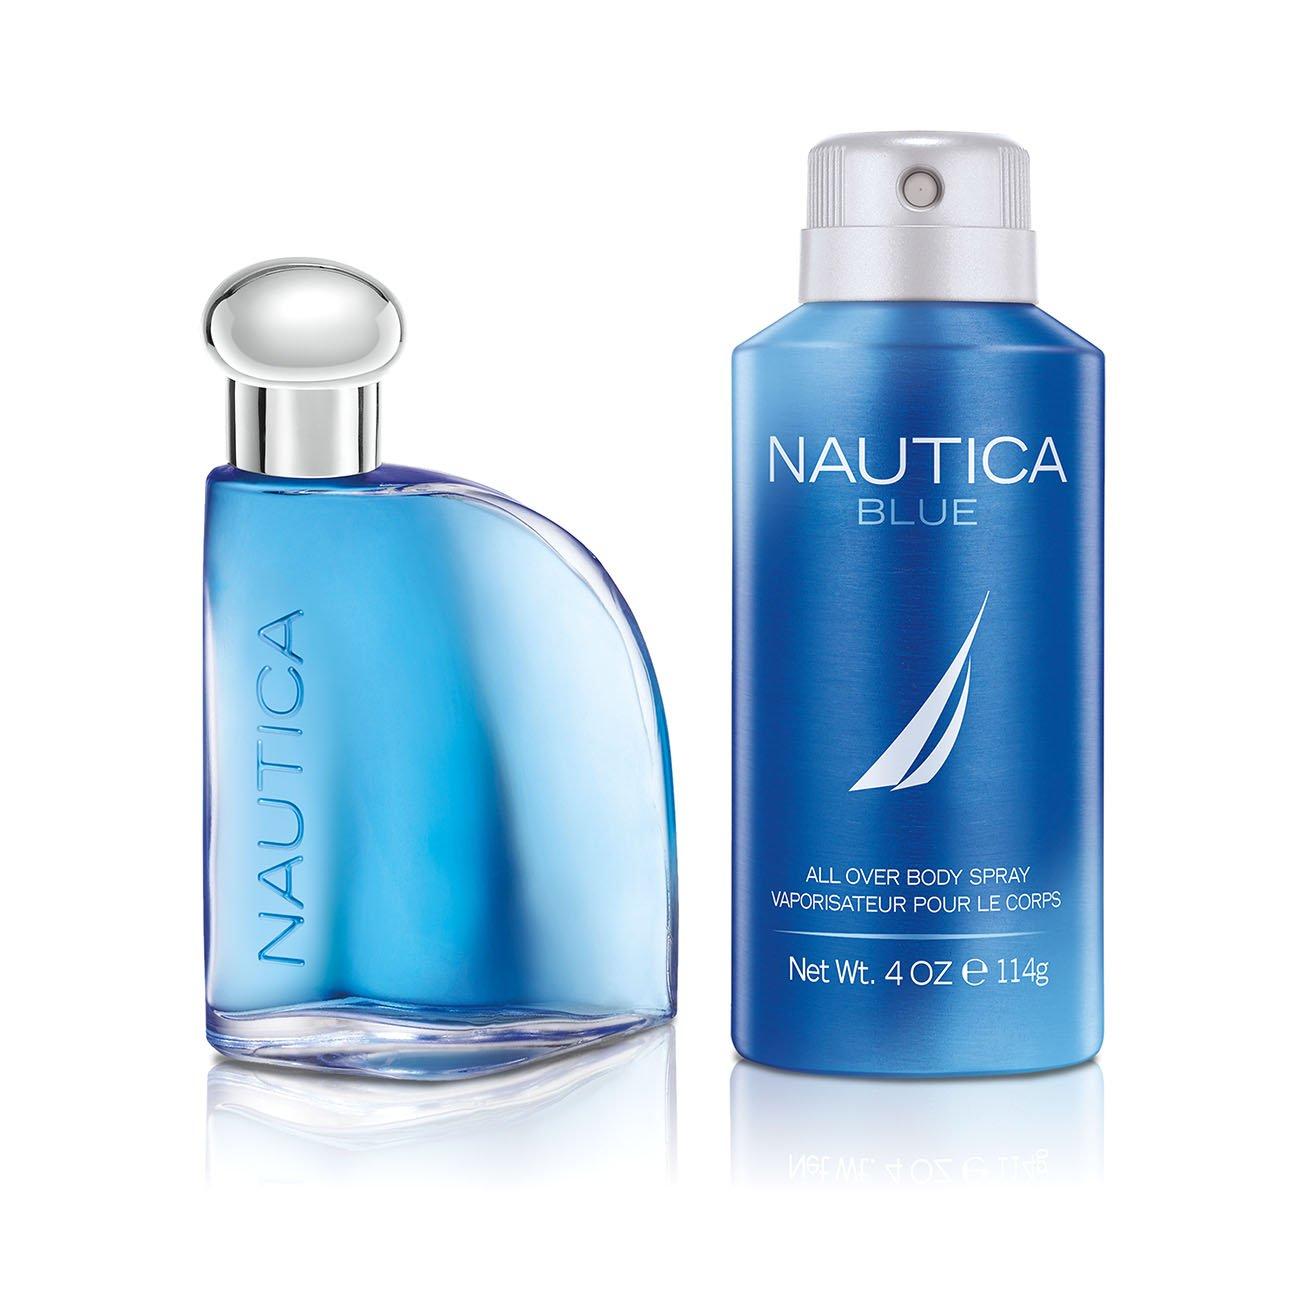 Nautica Blue, Men's Fragrance, 2 Piece Set,  1.7 oz. Eau de Toilette, 4.0 oz. Deodorizing Body Spray, Classic Scents, Great Gift Set